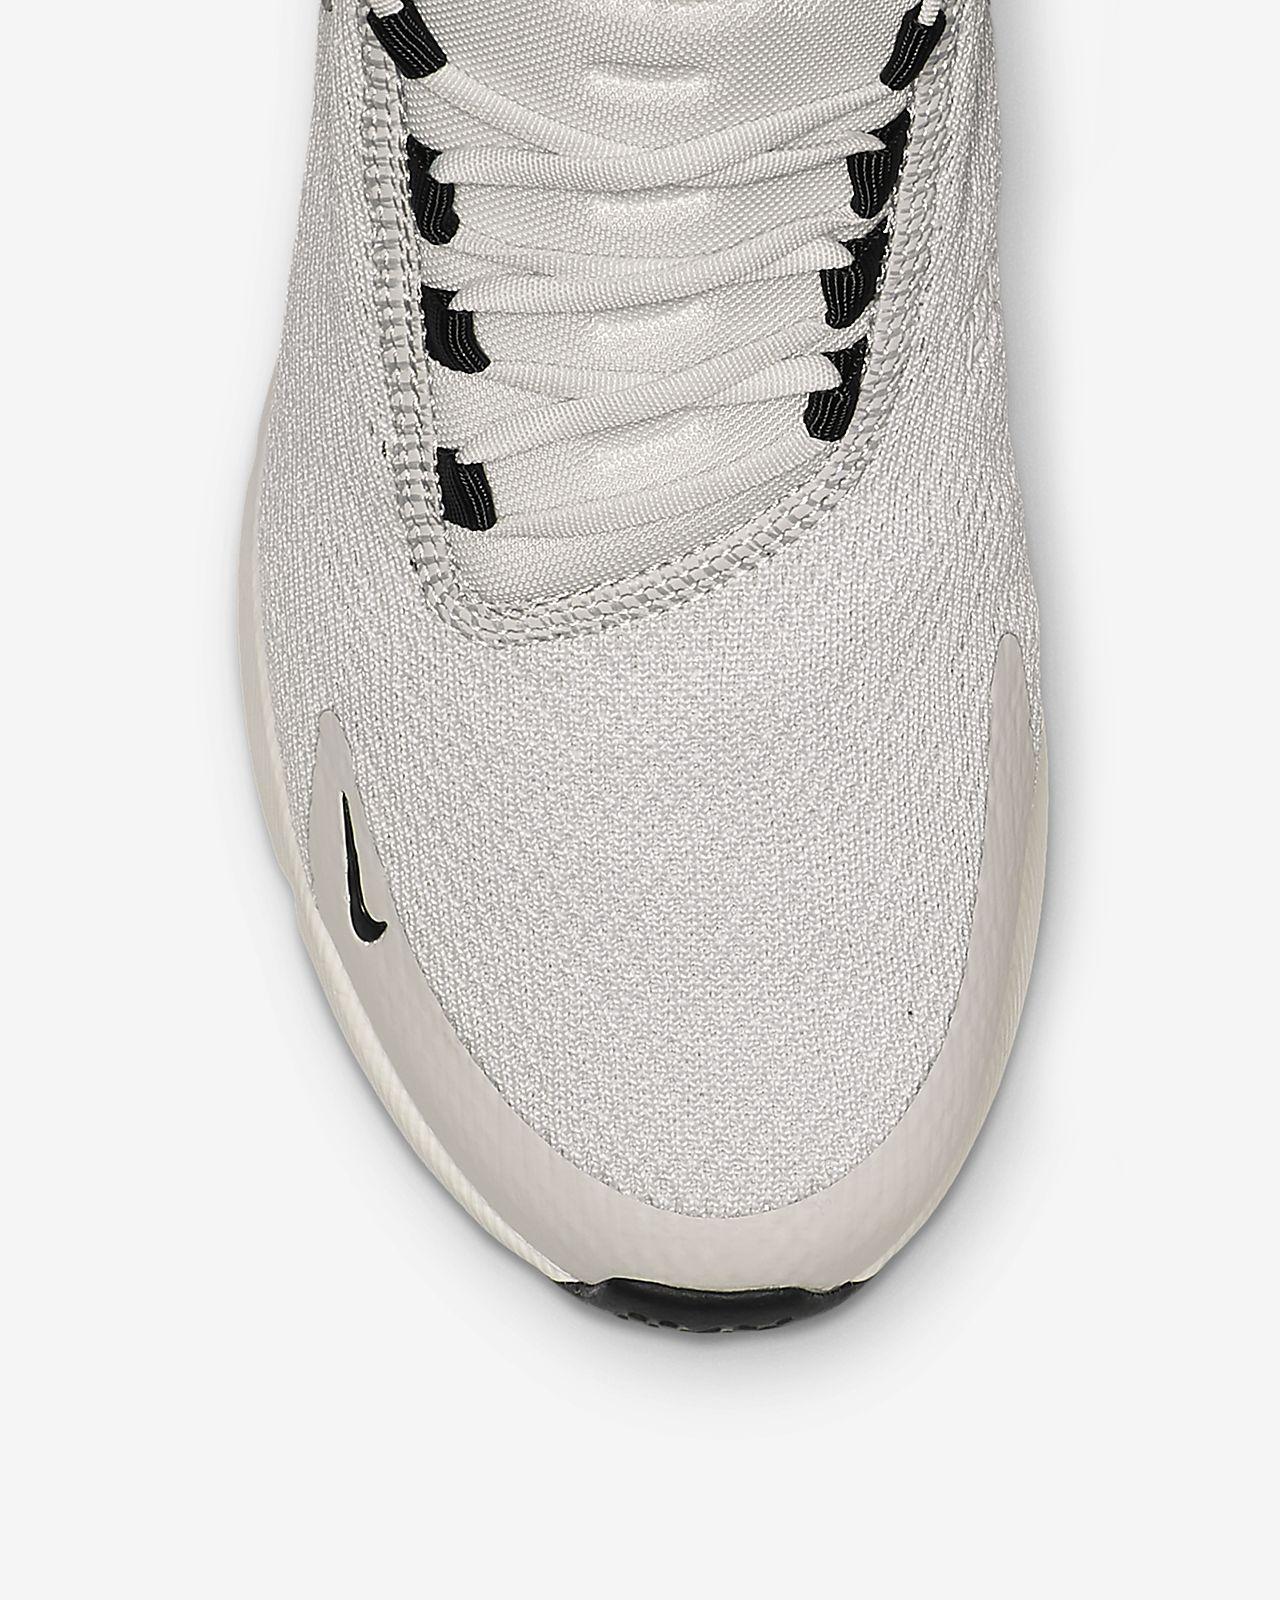 separation shoes e6e32 4a2a1 ... Nike Air Max 270 Women s Shoe